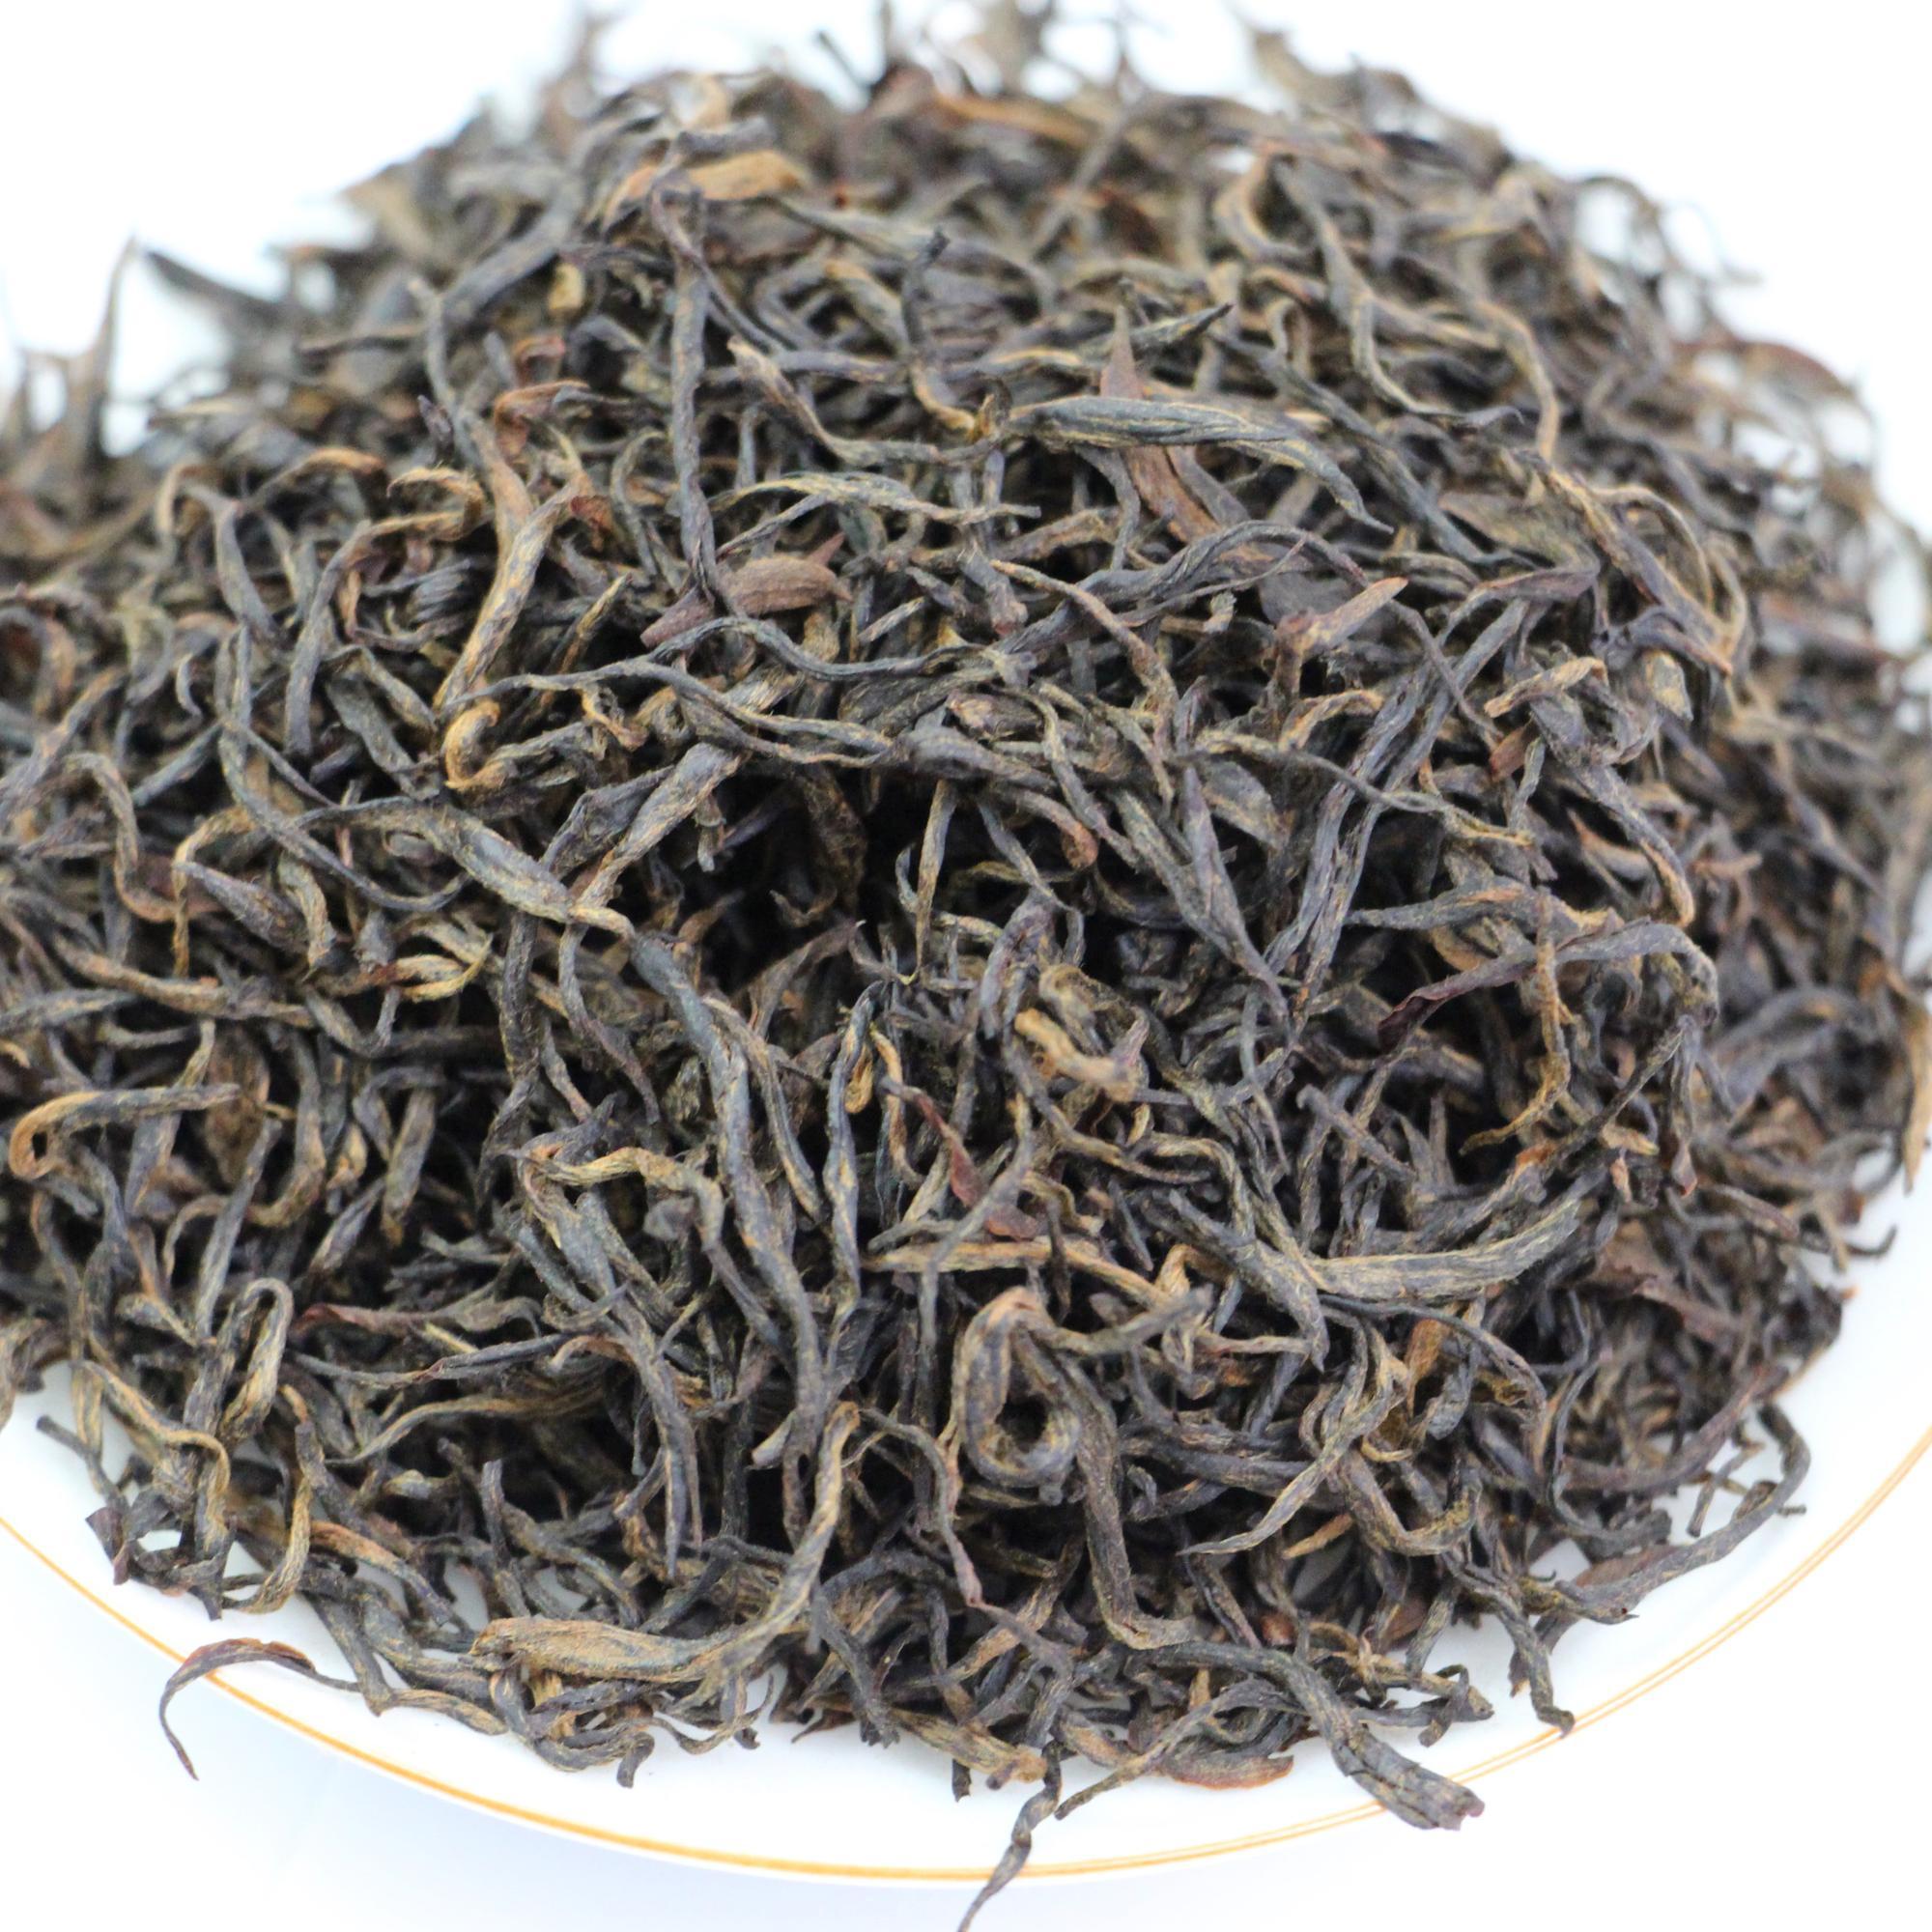 All tea flavors best websites tea black tea - 4uTea   4uTea.com